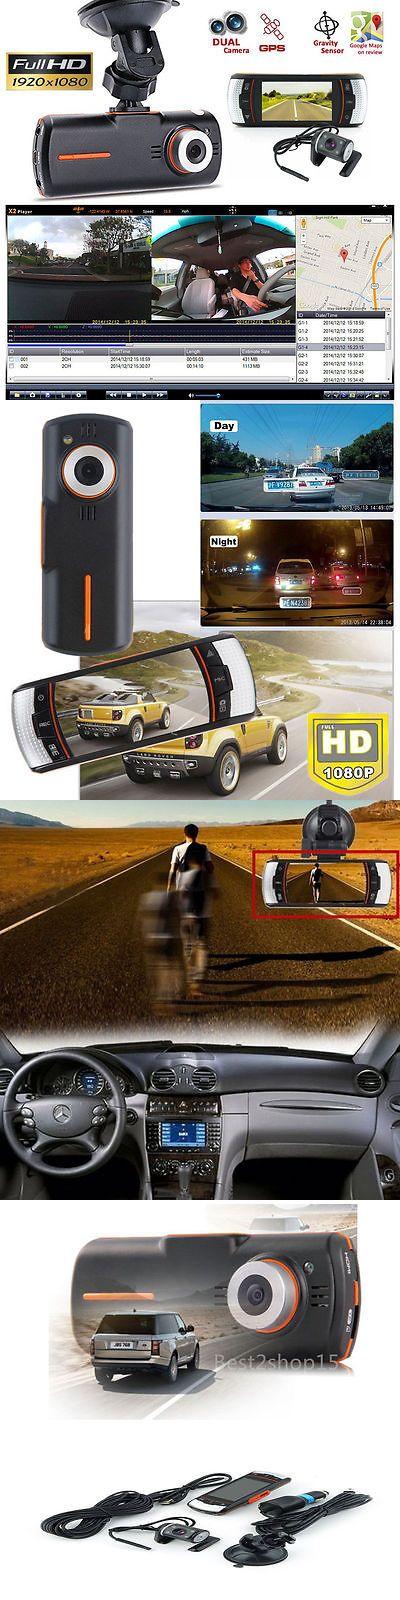 Digital Video Recorders Cards: 2.7 Vehicle 1080P Car Dvr Camera Video Recorder Dash Cam G-Sensor Gps Dual Lens -> BUY IT NOW ONLY: $38.2 on eBay!